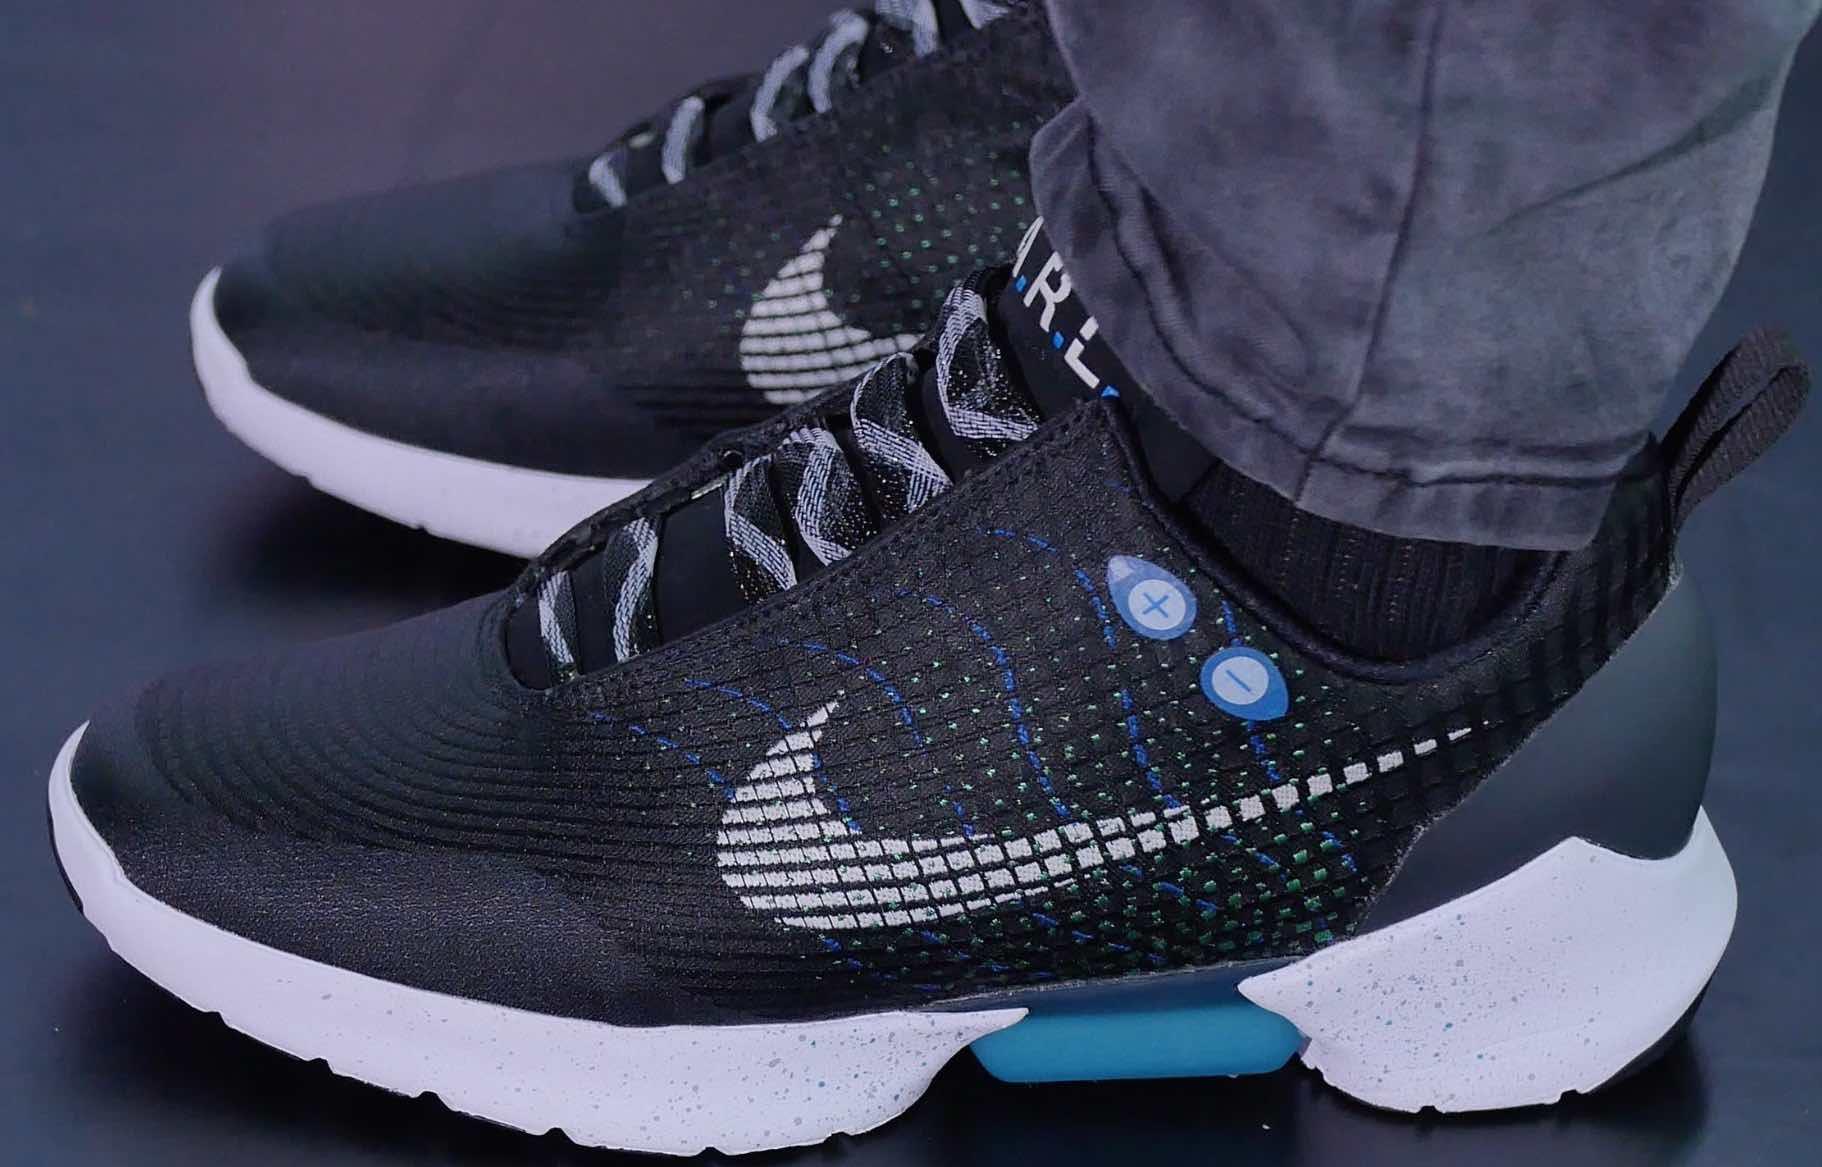 Nike HyperAdapt 1.0 : la chaussure auto laçante à 720